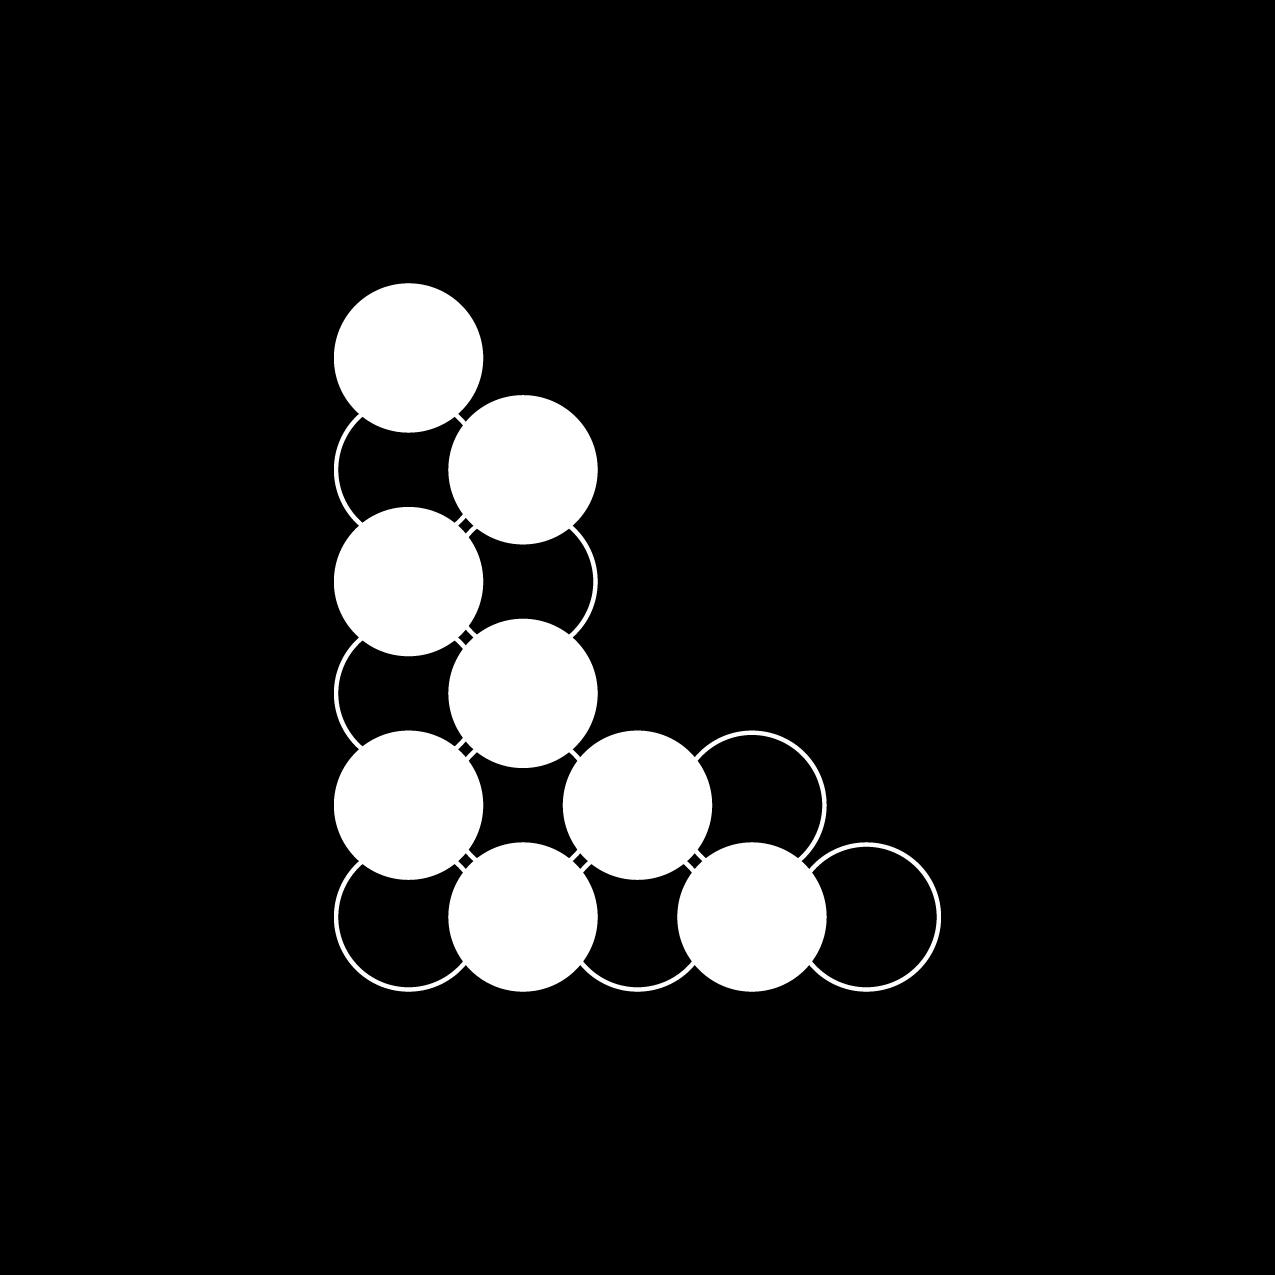 Letter L10 Design by Furia